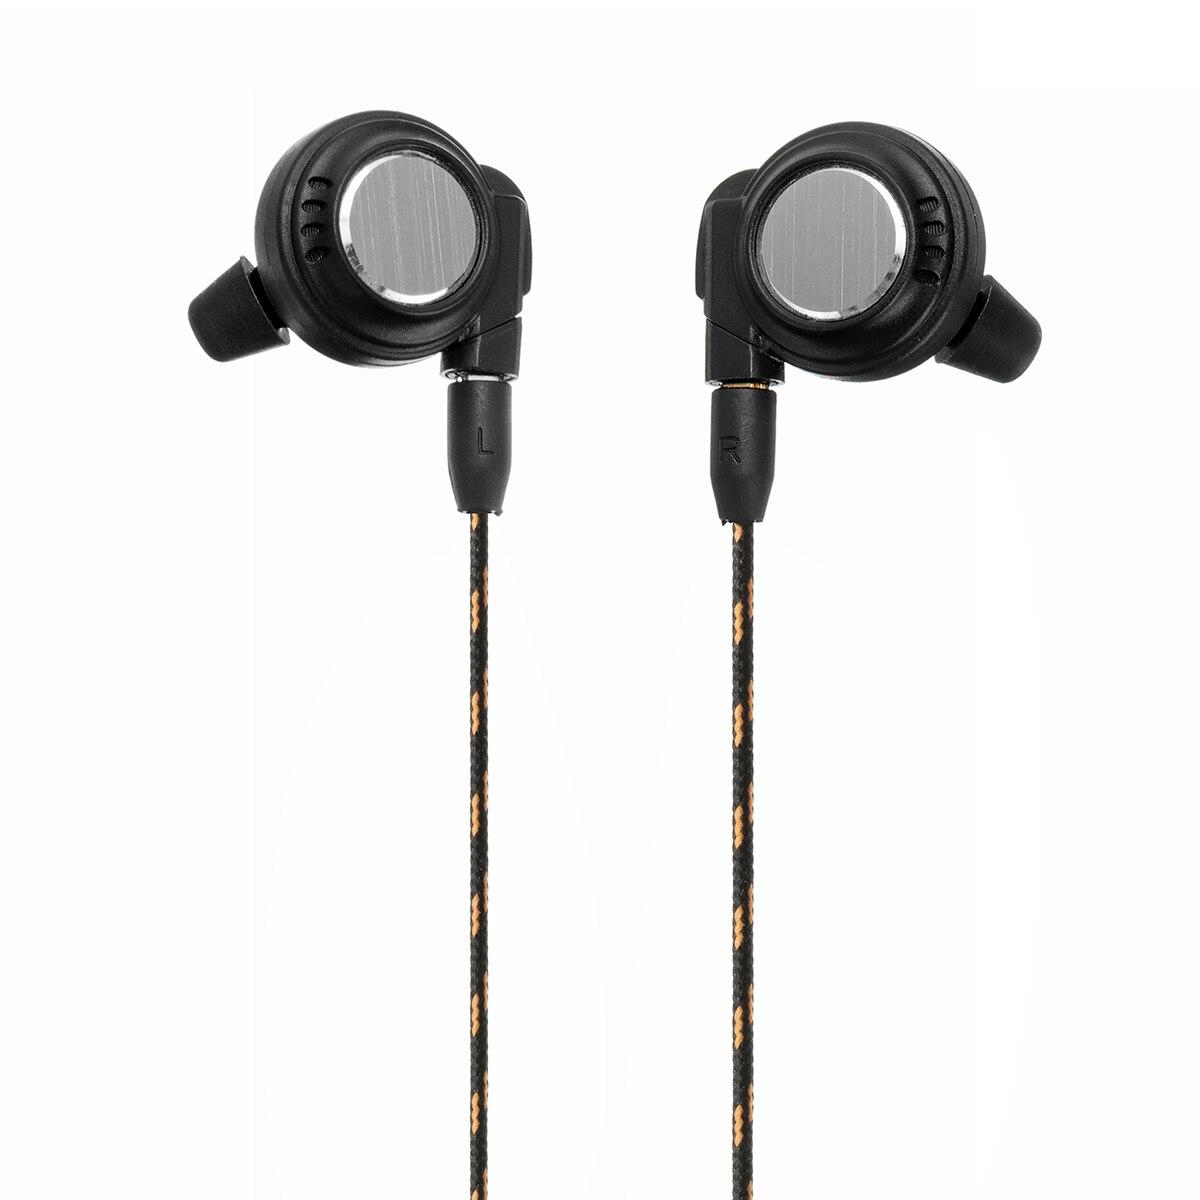 LEORY EB-GDX Bone Conduction Wireless Bluetooth Earphone Wired Earphones Stereo HiFi Earbuds with Mic Waterproof Headset